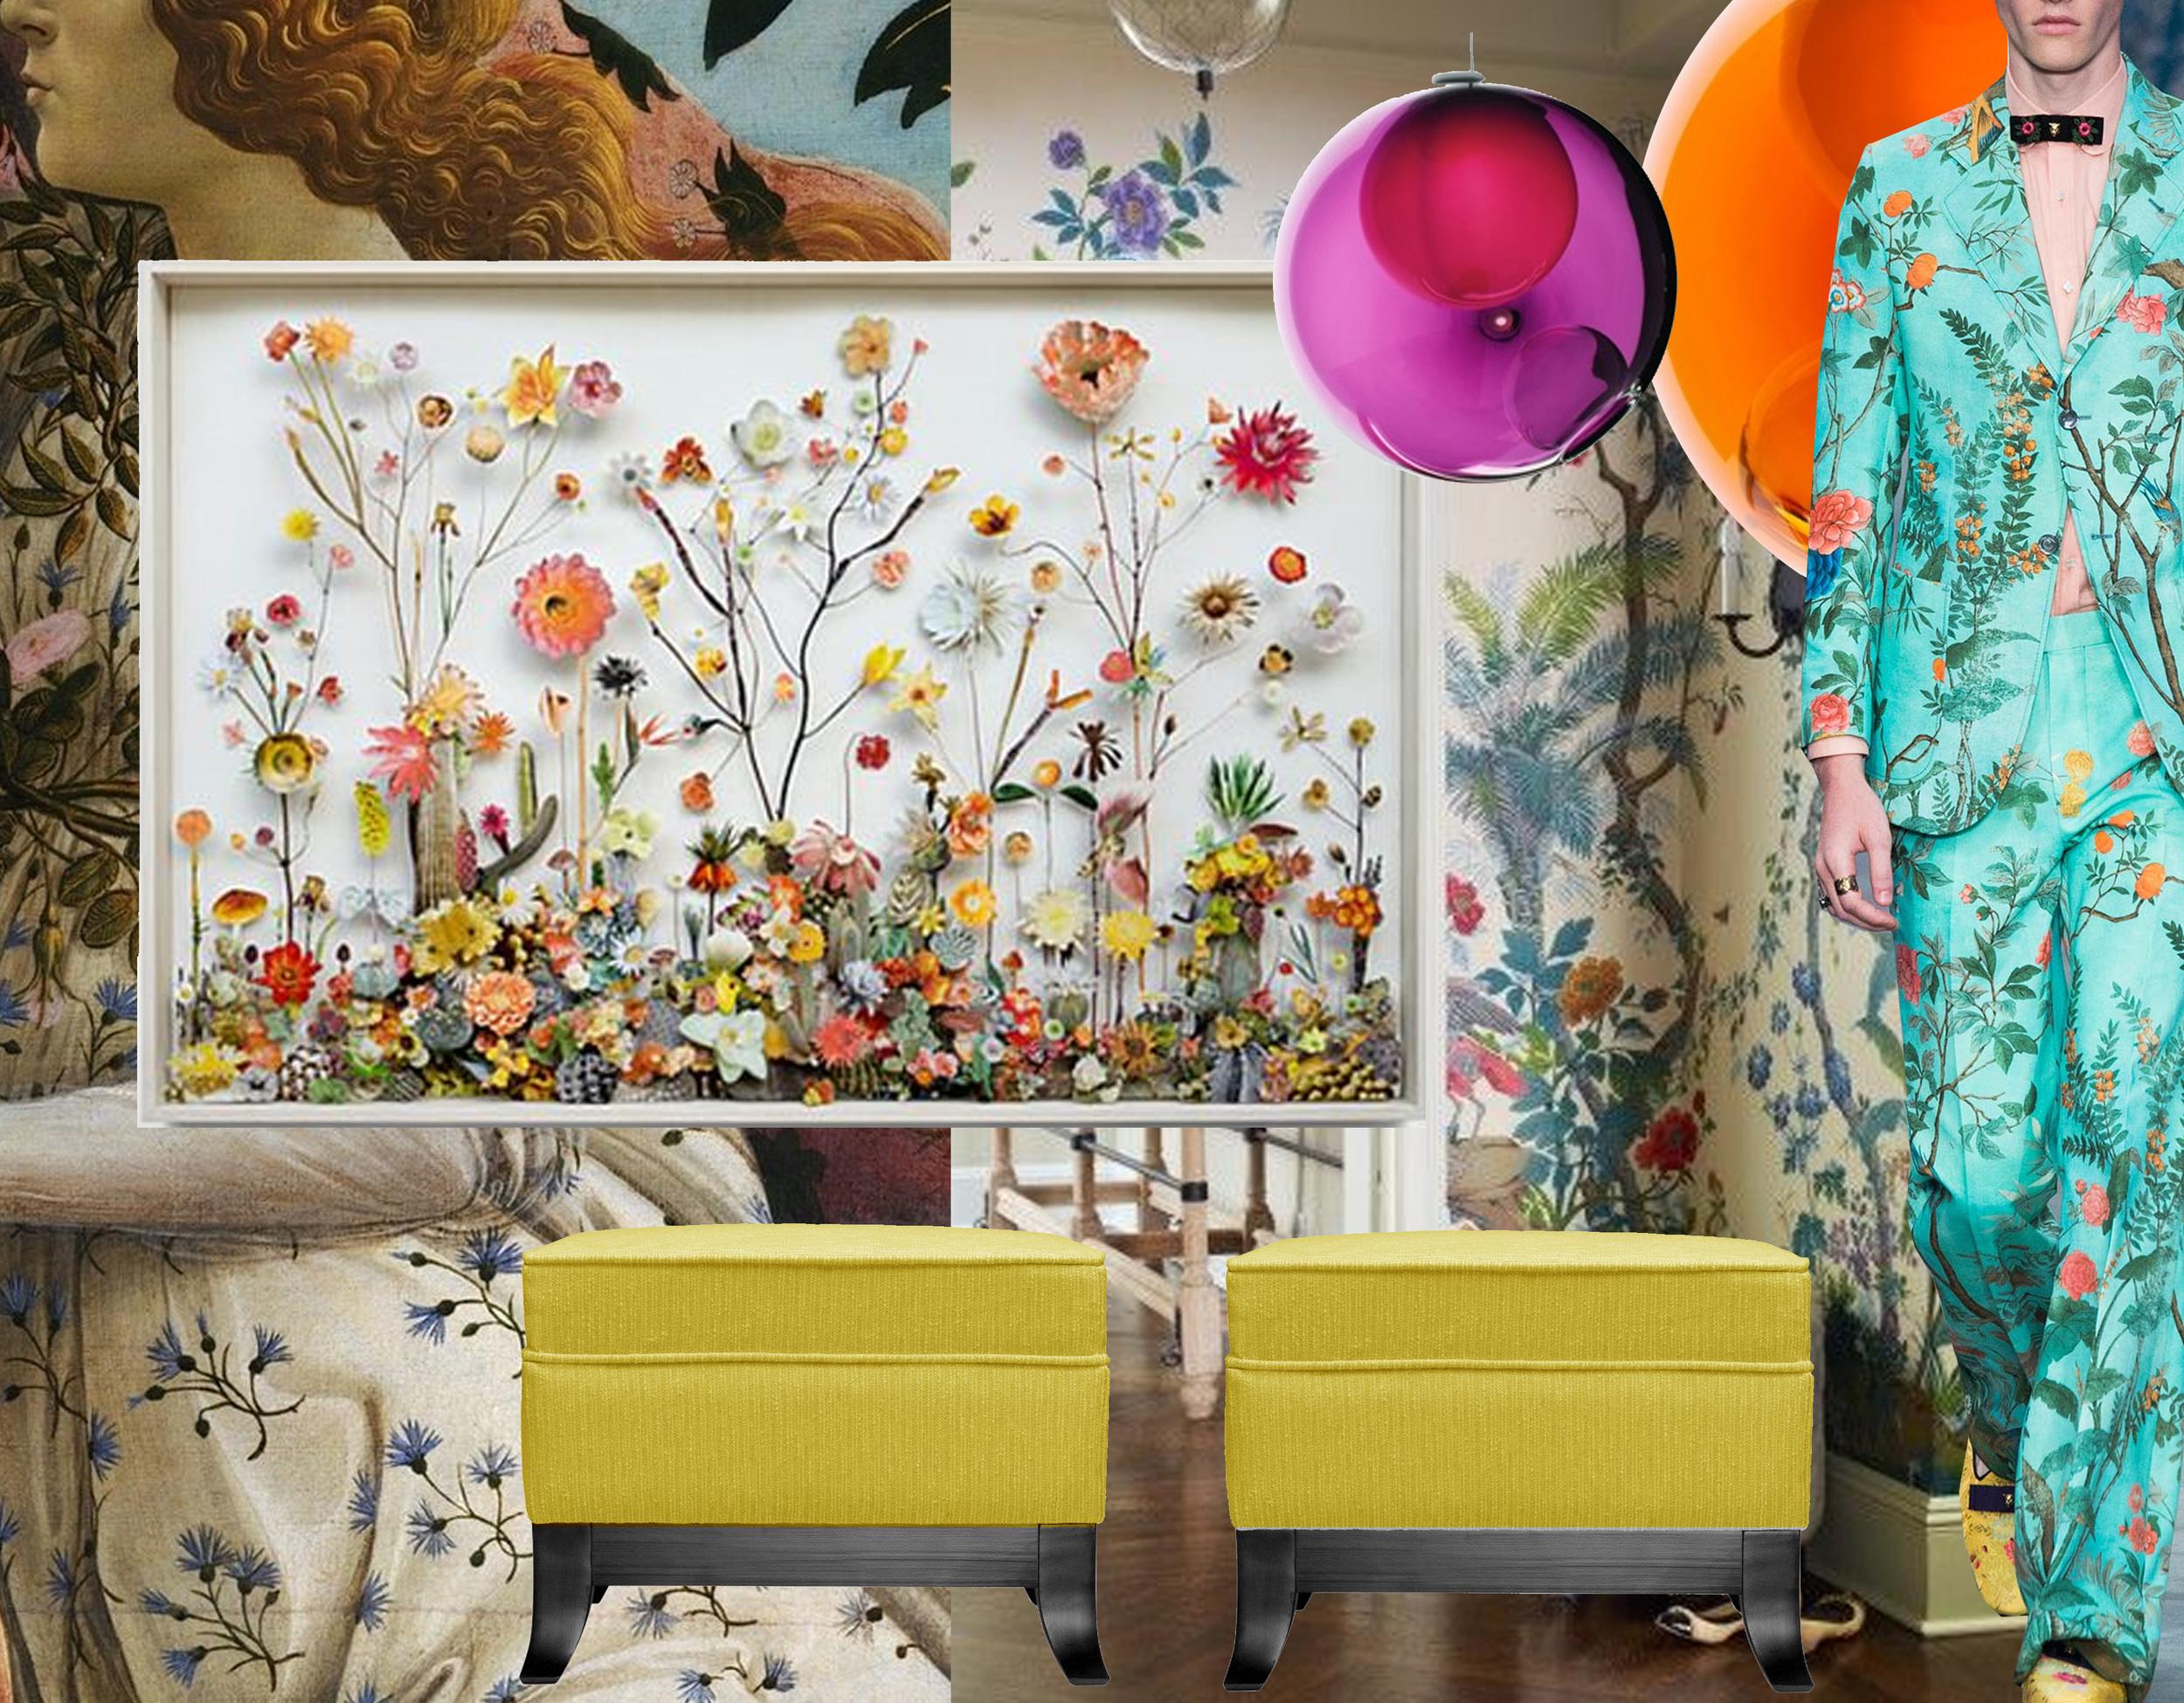 detail Primavera  Botticelli  - Flower Construction  Ann Ten Donkelaar  - wallpaper found on  Daily Dream Decor  - coloured lamps  Bocci  -  Gucci  summer 2016 - pouf Judd  Marie's Corner